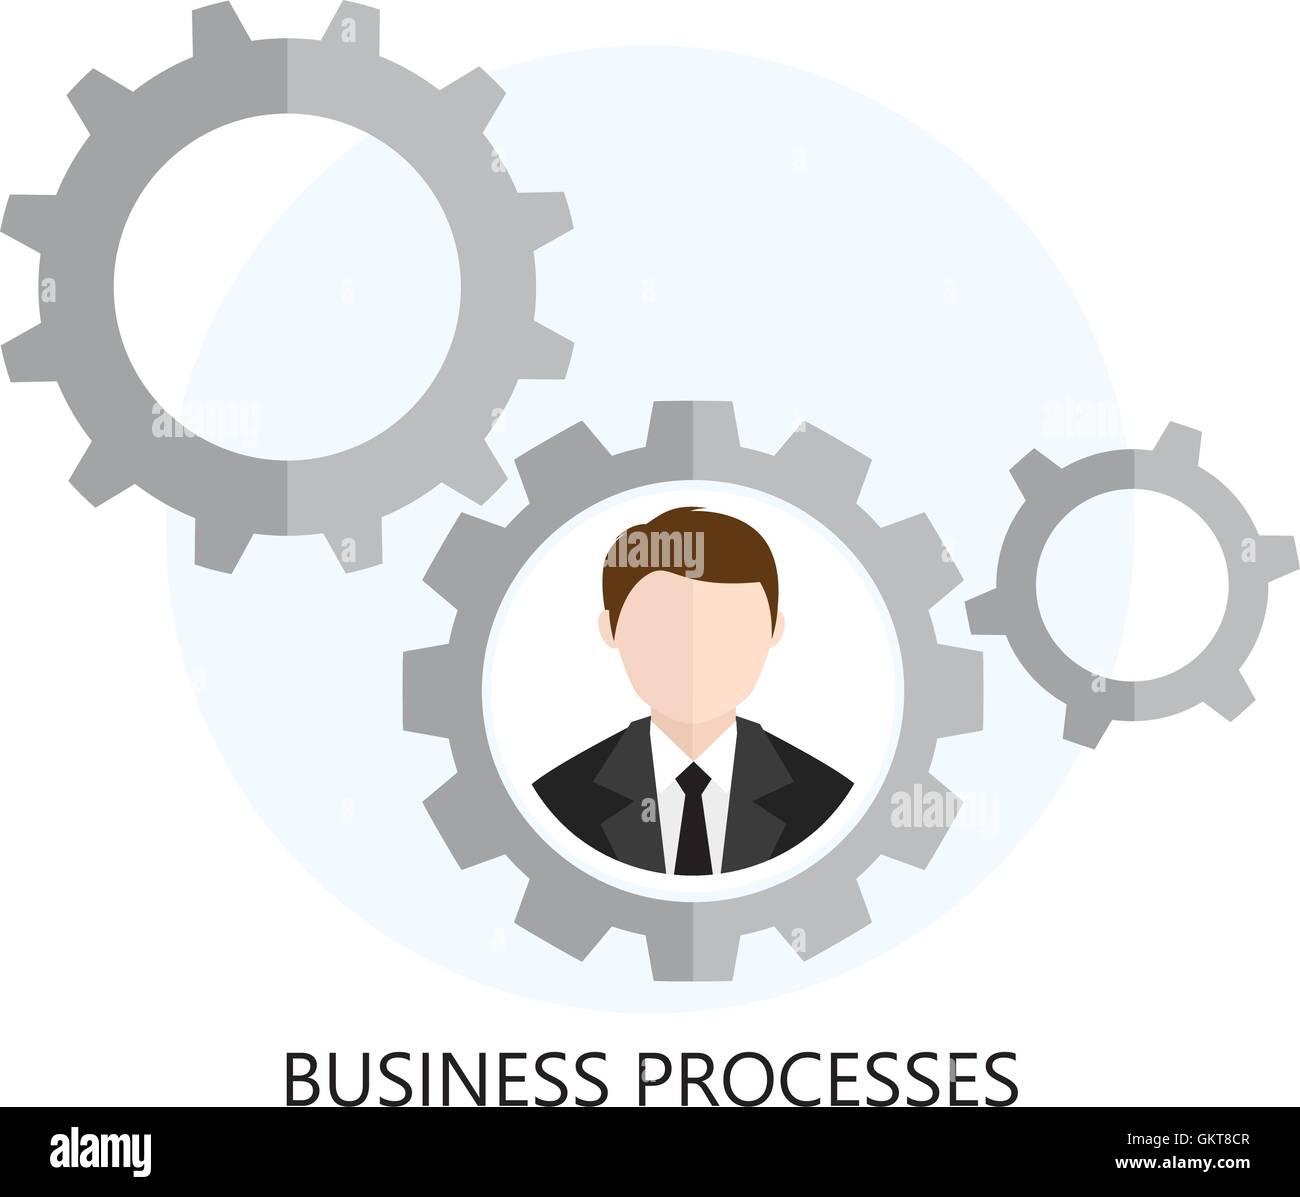 Business Processes Icon Flat design  Concept - Stock Image